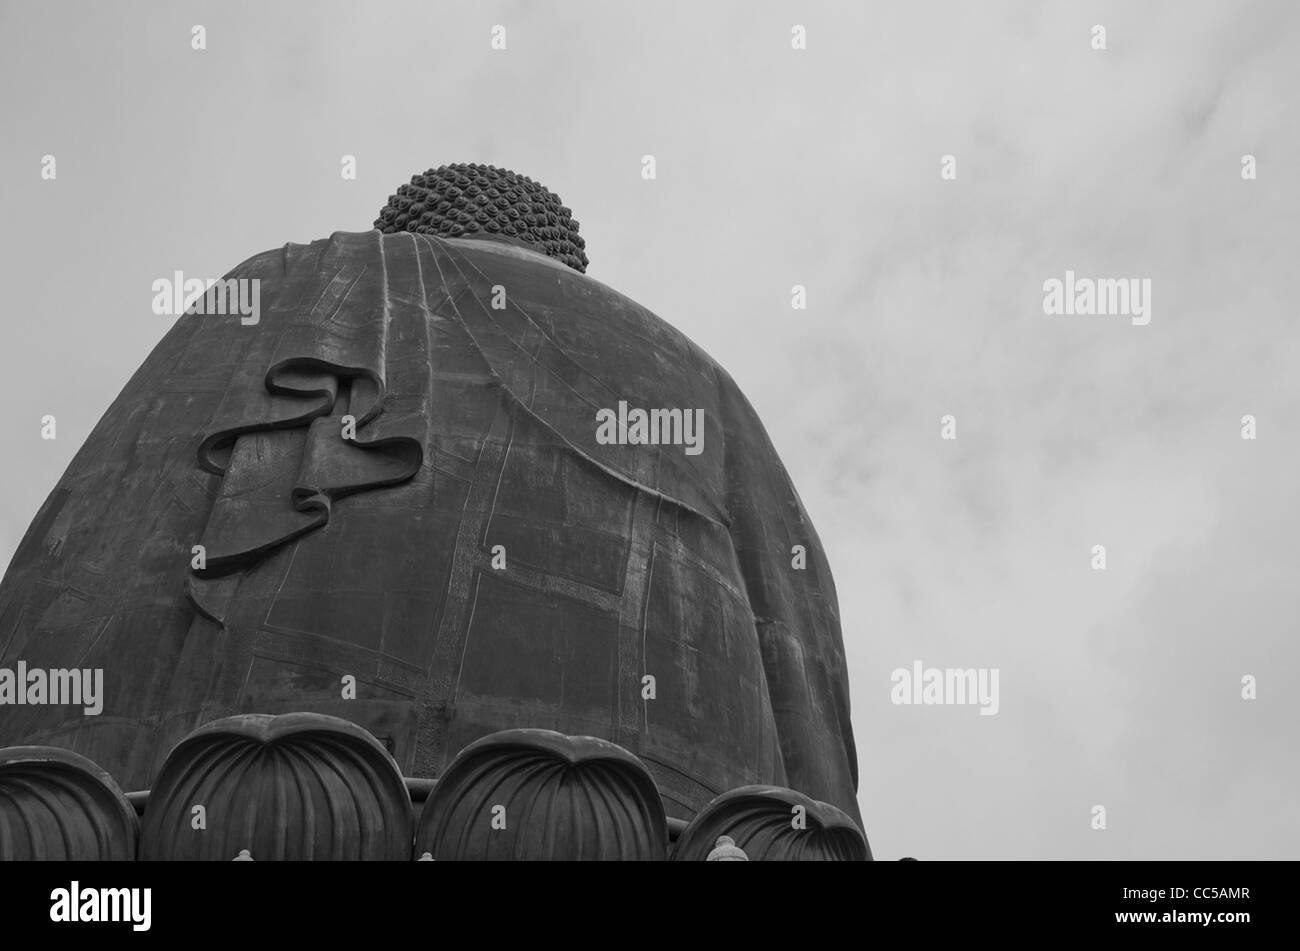 Giant Buddha in Lantau Island, Hong Kong, Asia - Stock Image